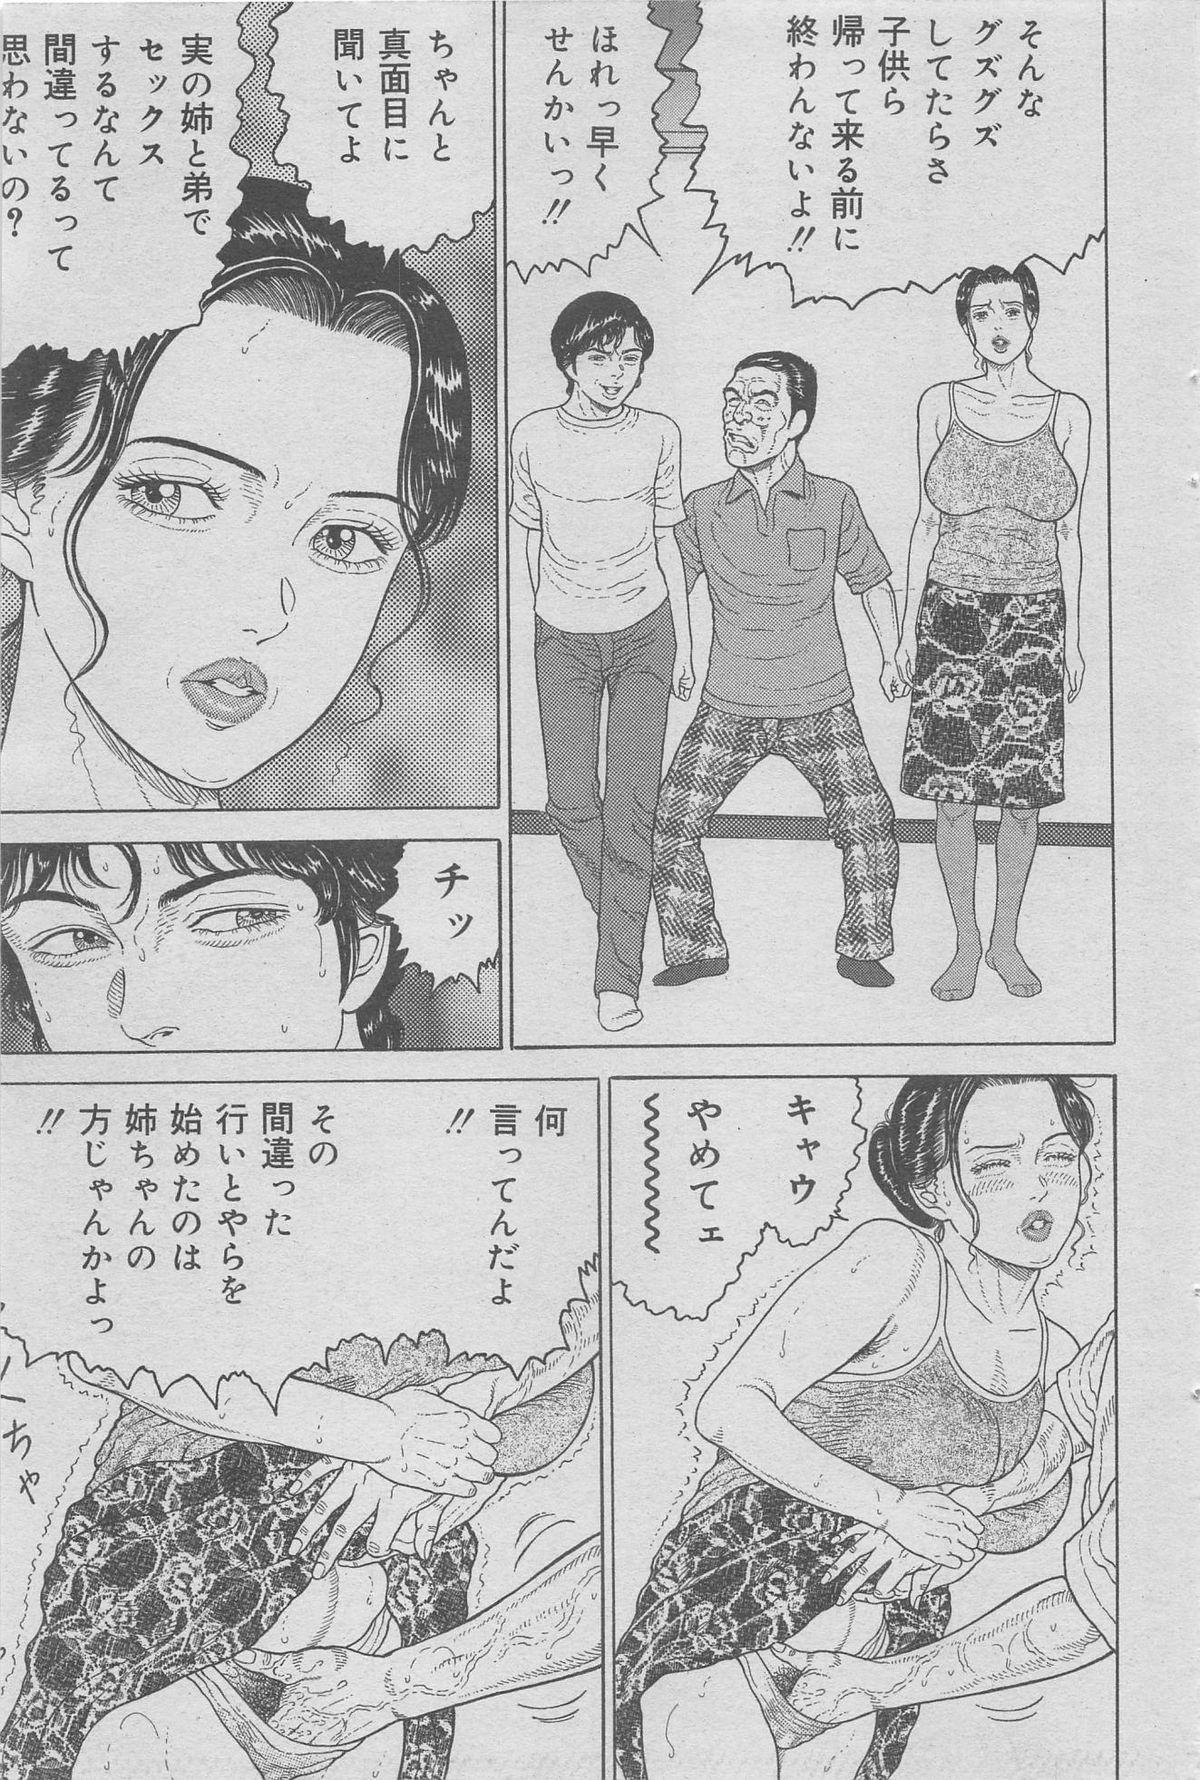 Hontou ni Atta Kindanai vol.7 98